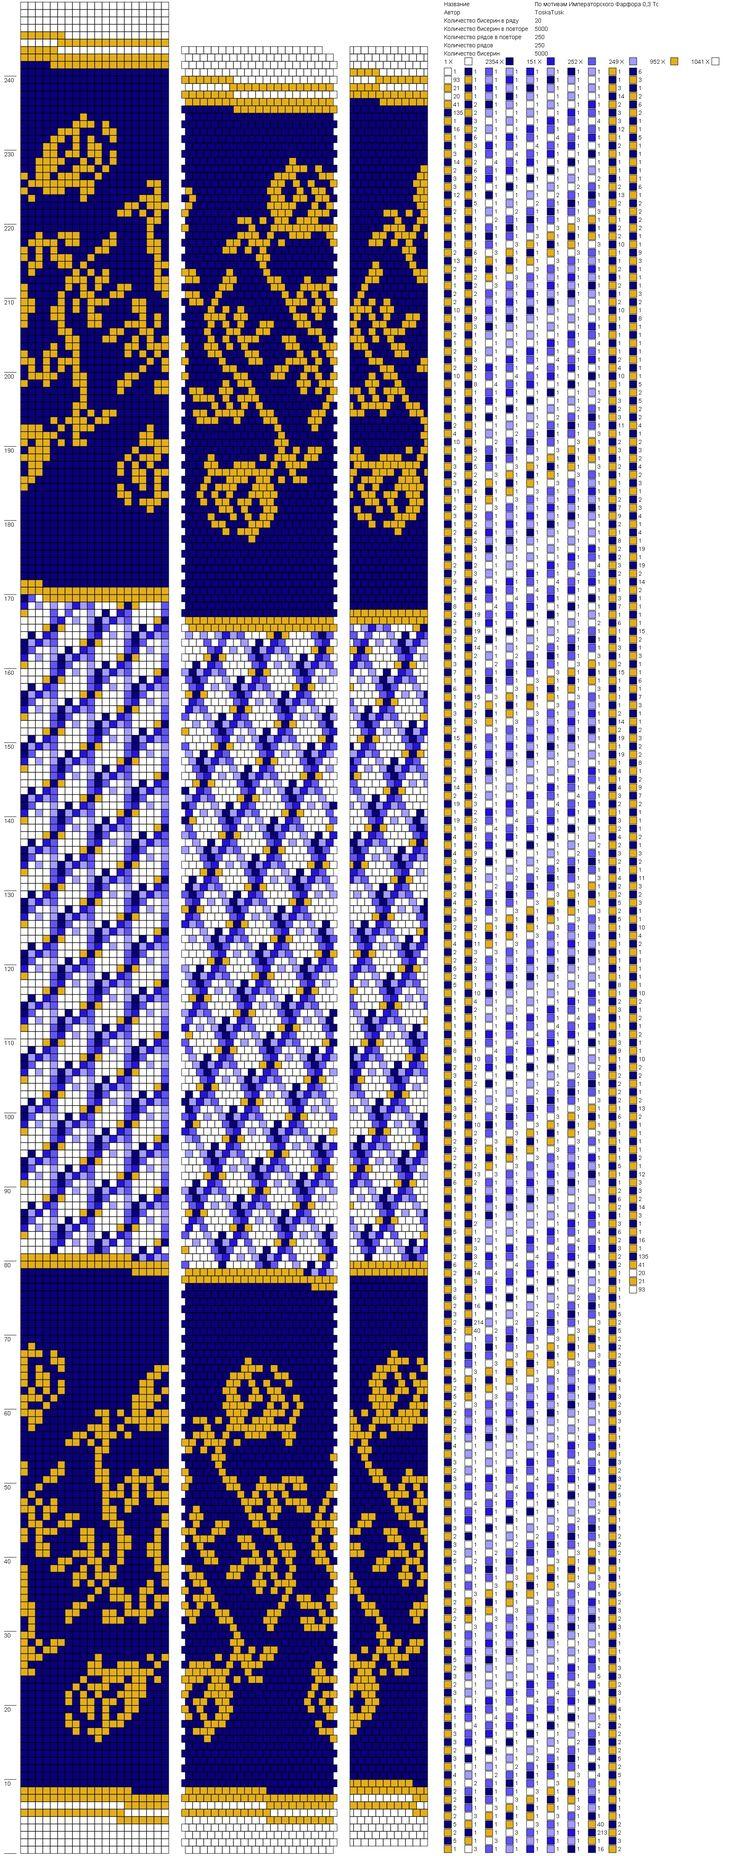 По мотивам Императорского Фарфора 0,3 ToskaTusk 2в (20) http://crochetbeadpaint.info/raports/1999916